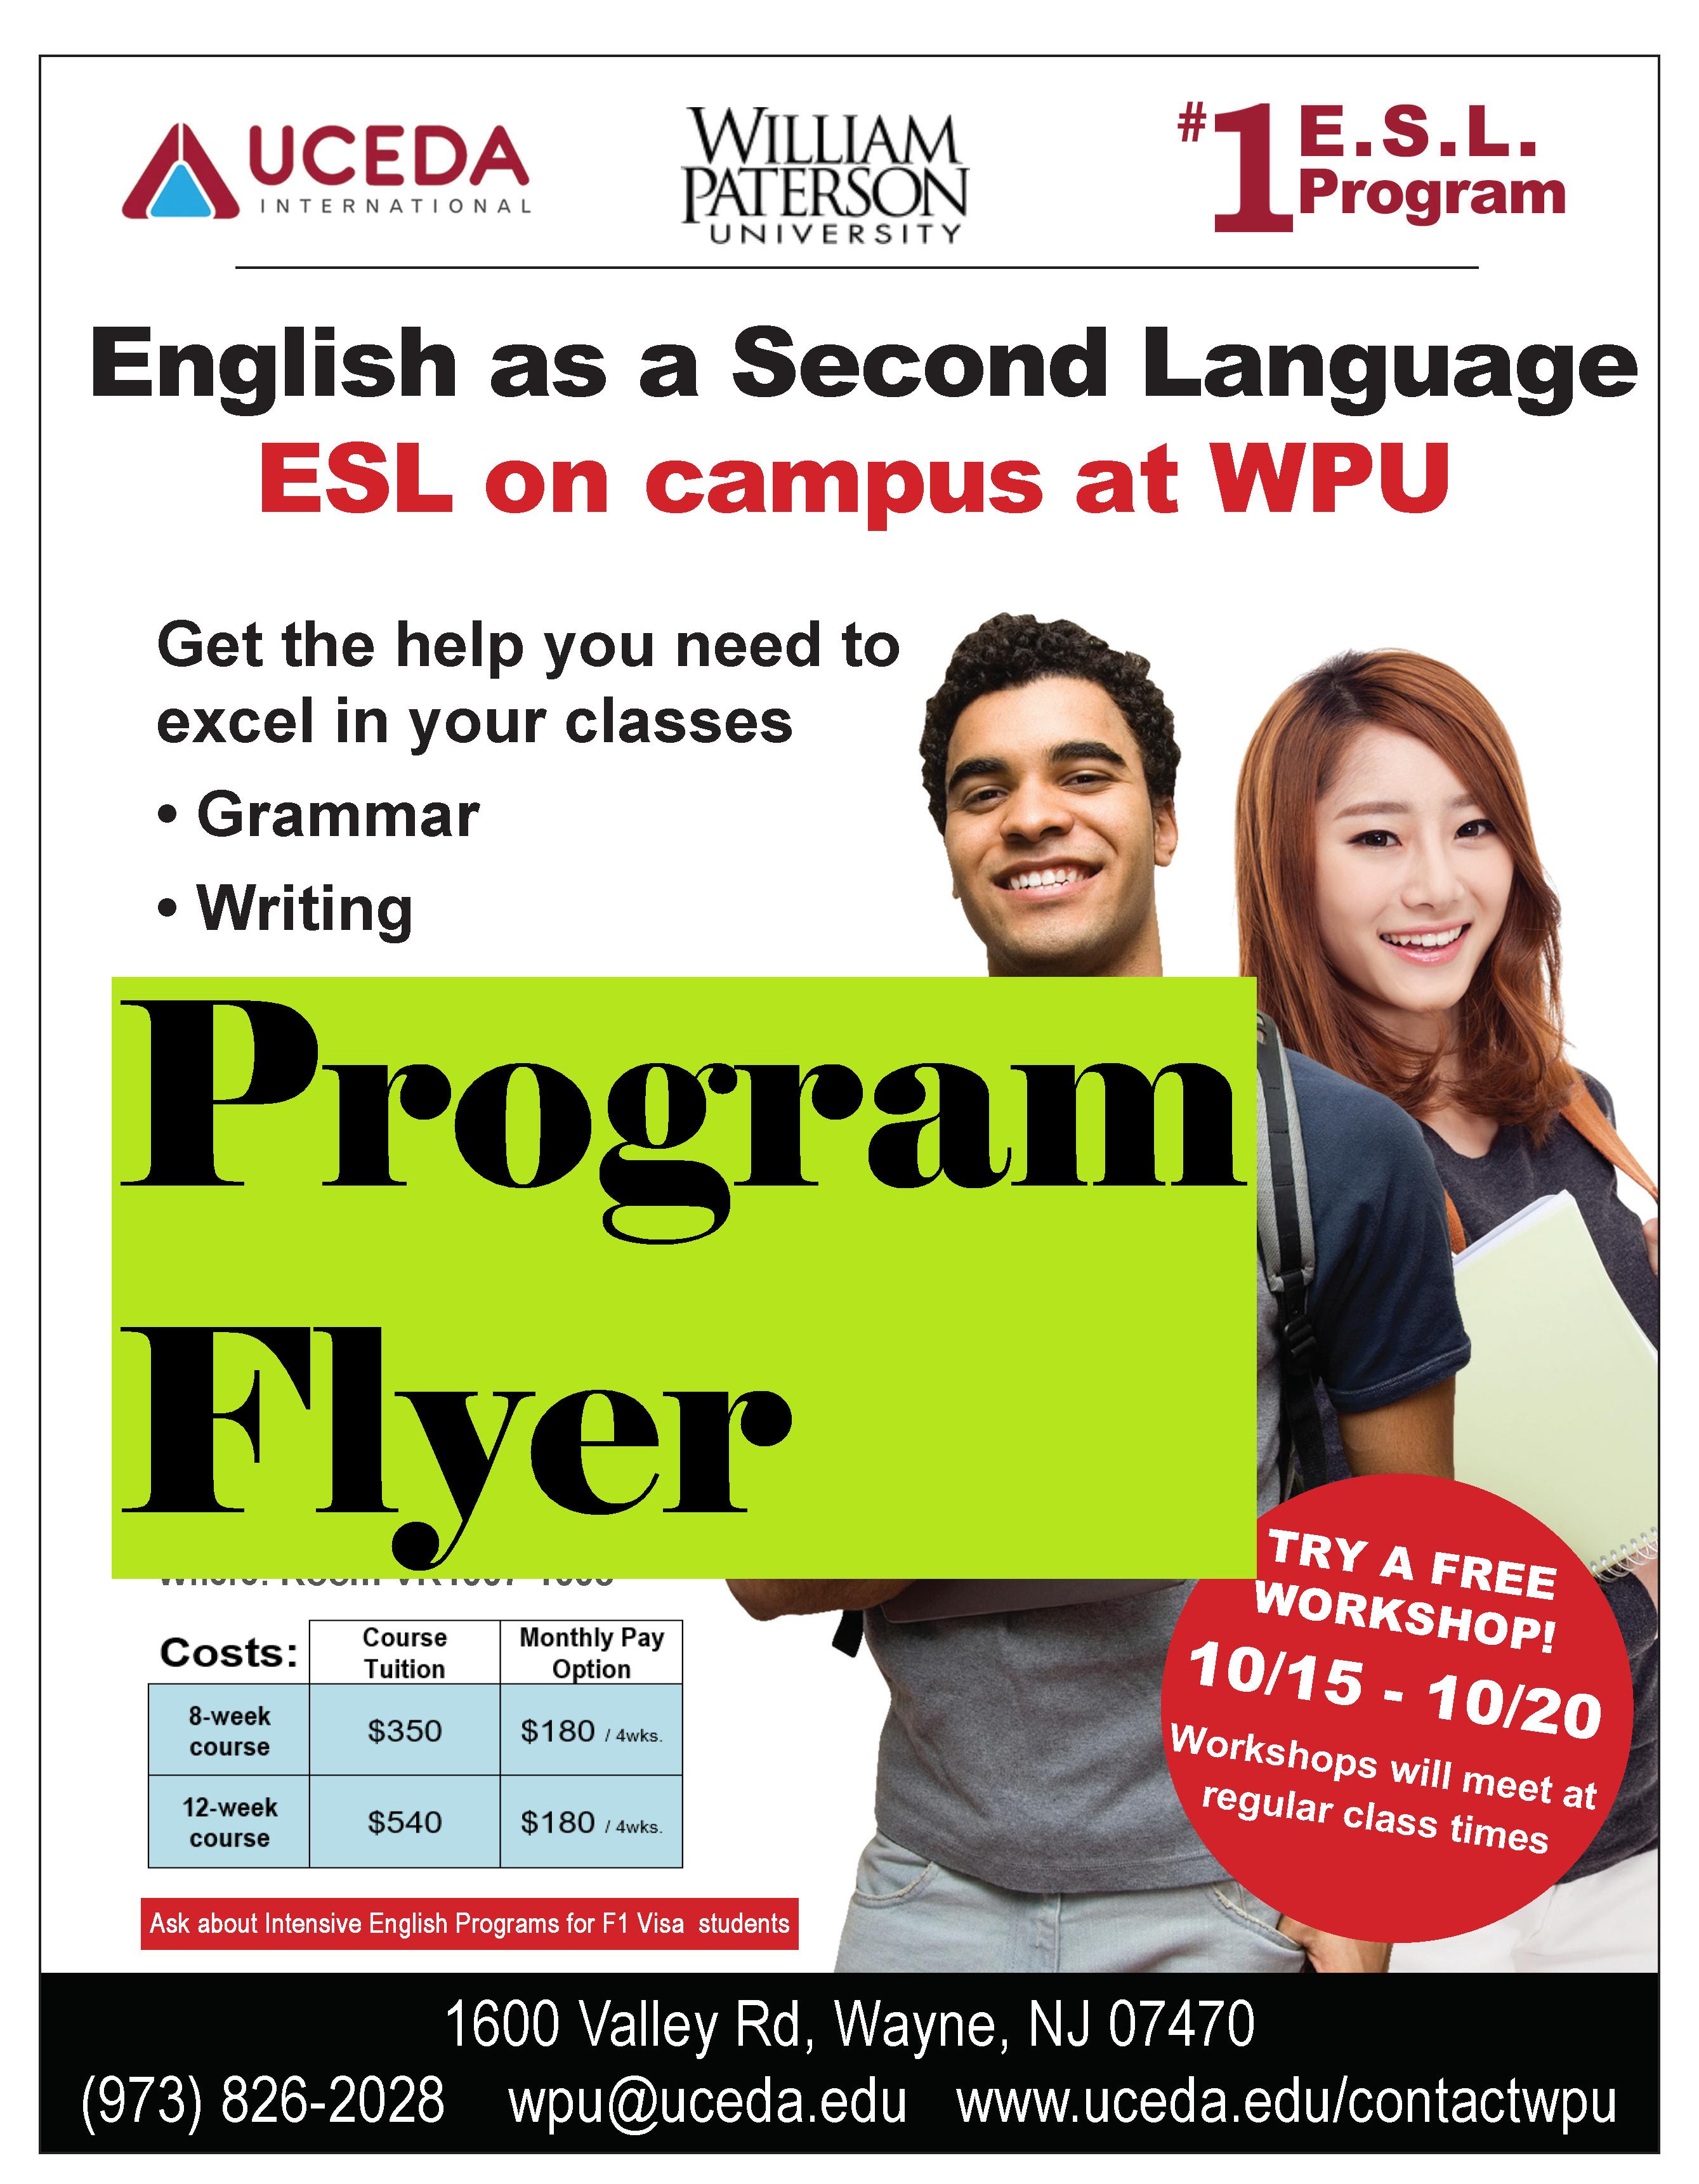 Esl Workshops William Paterson University